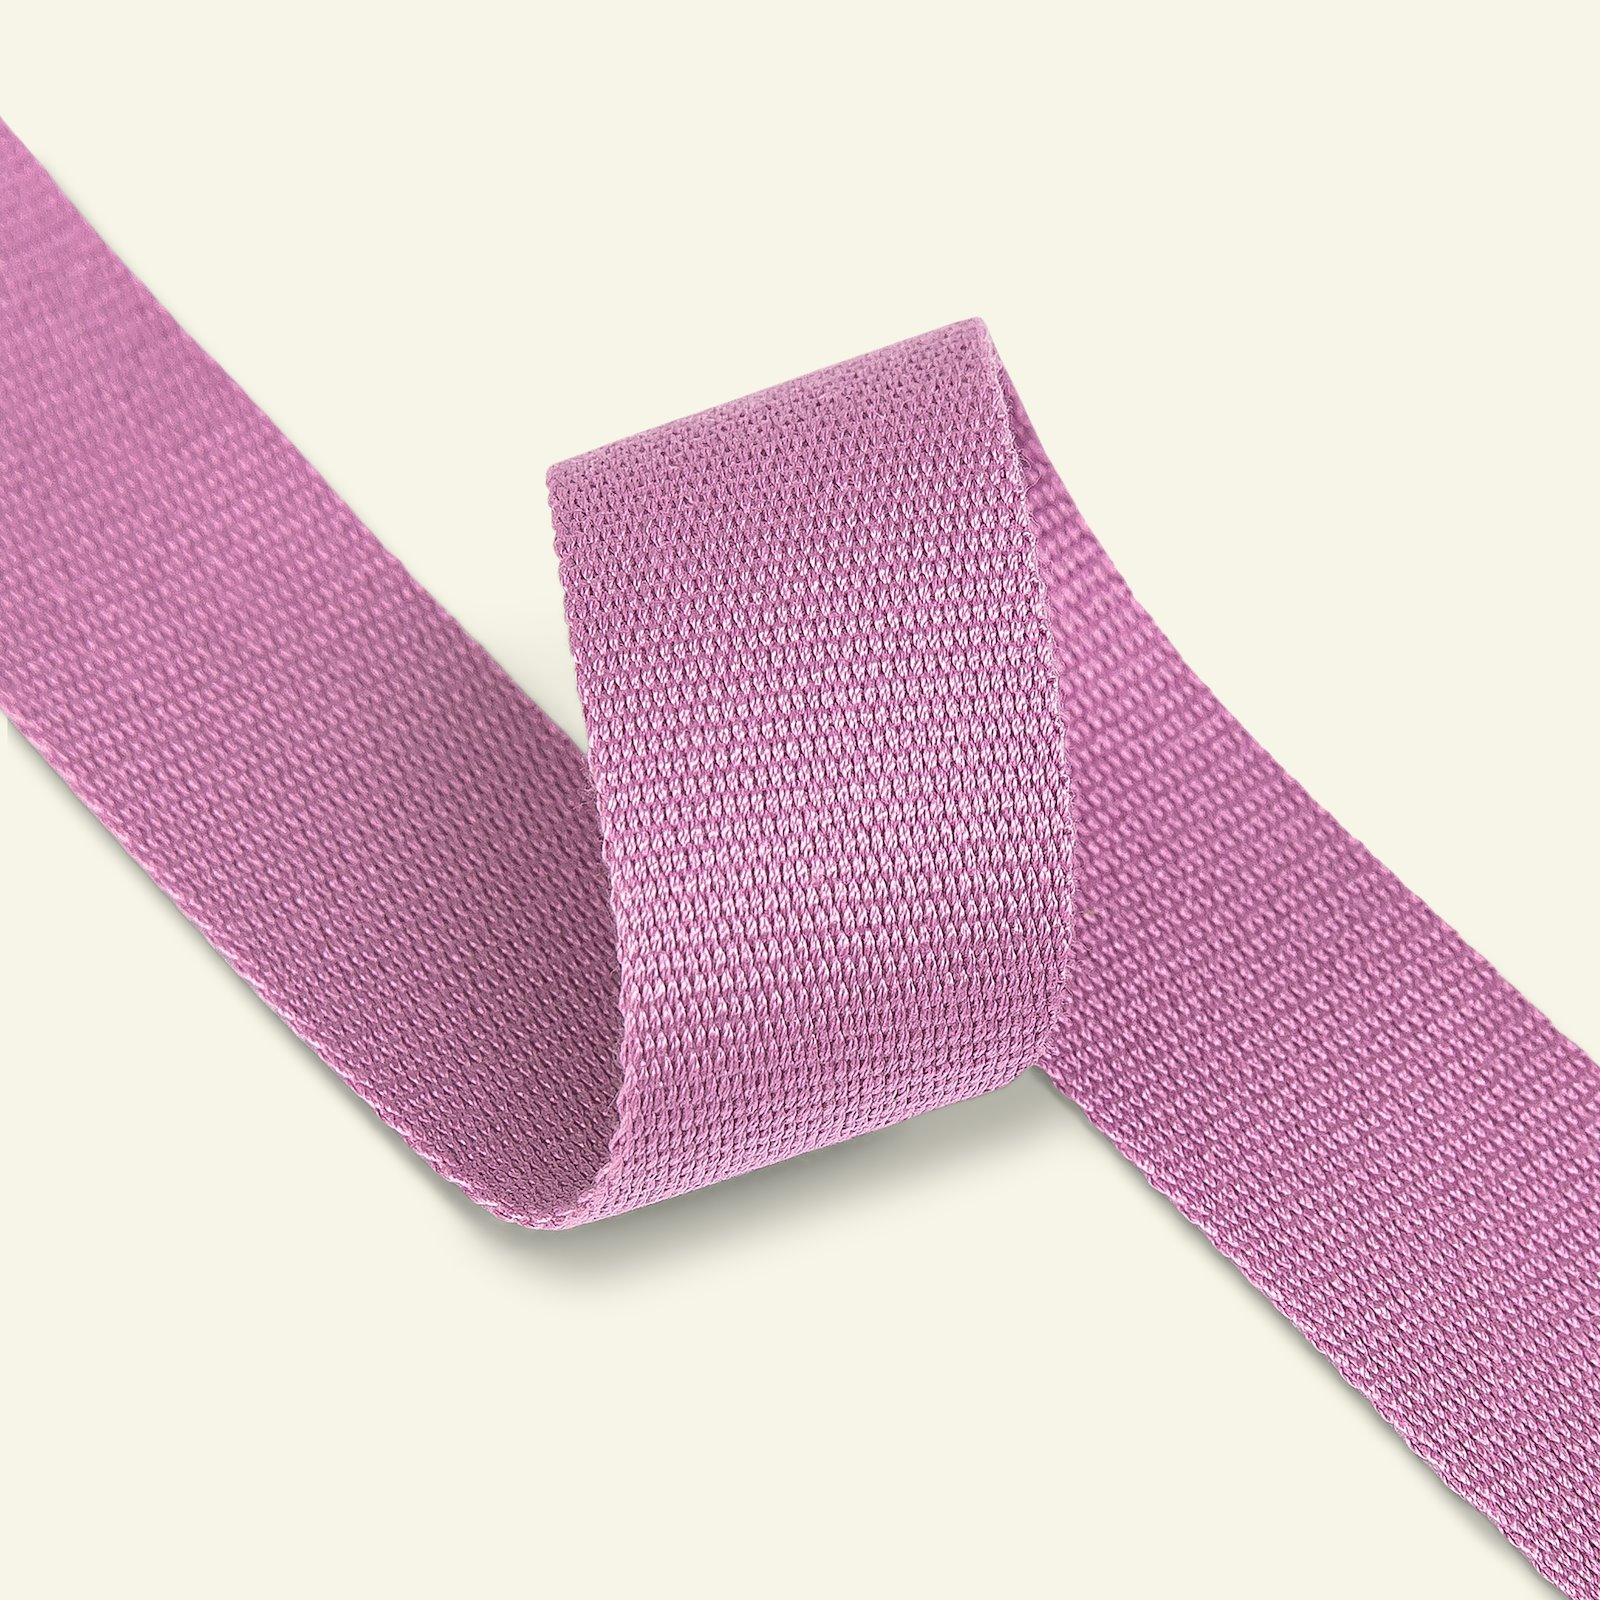 Ribbon woven 32mm light purple 3m 21439_pack